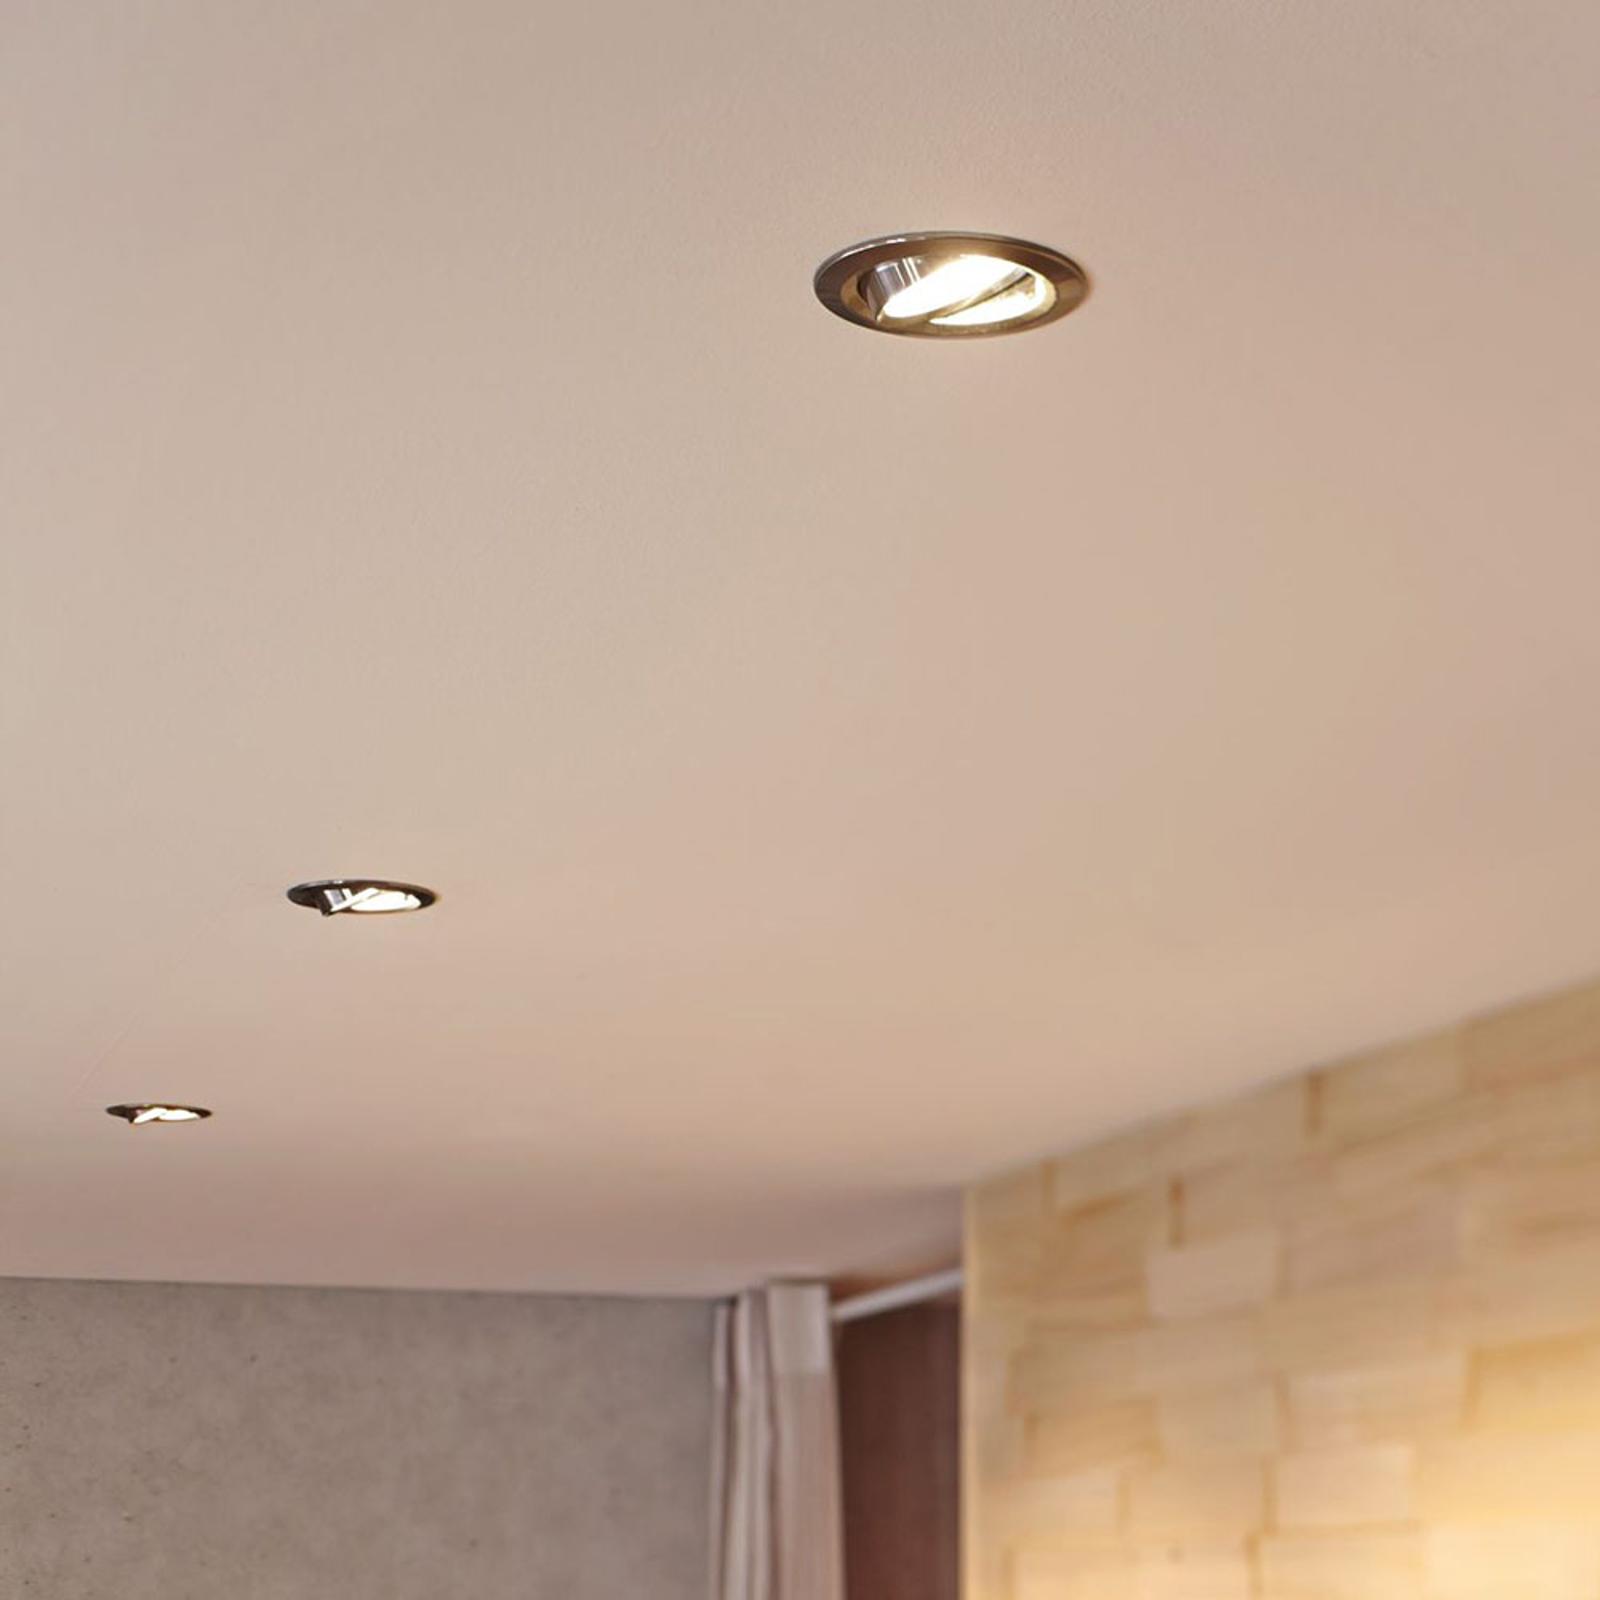 Paulmann Coin Slim 3 lampes LED chromées dimmables